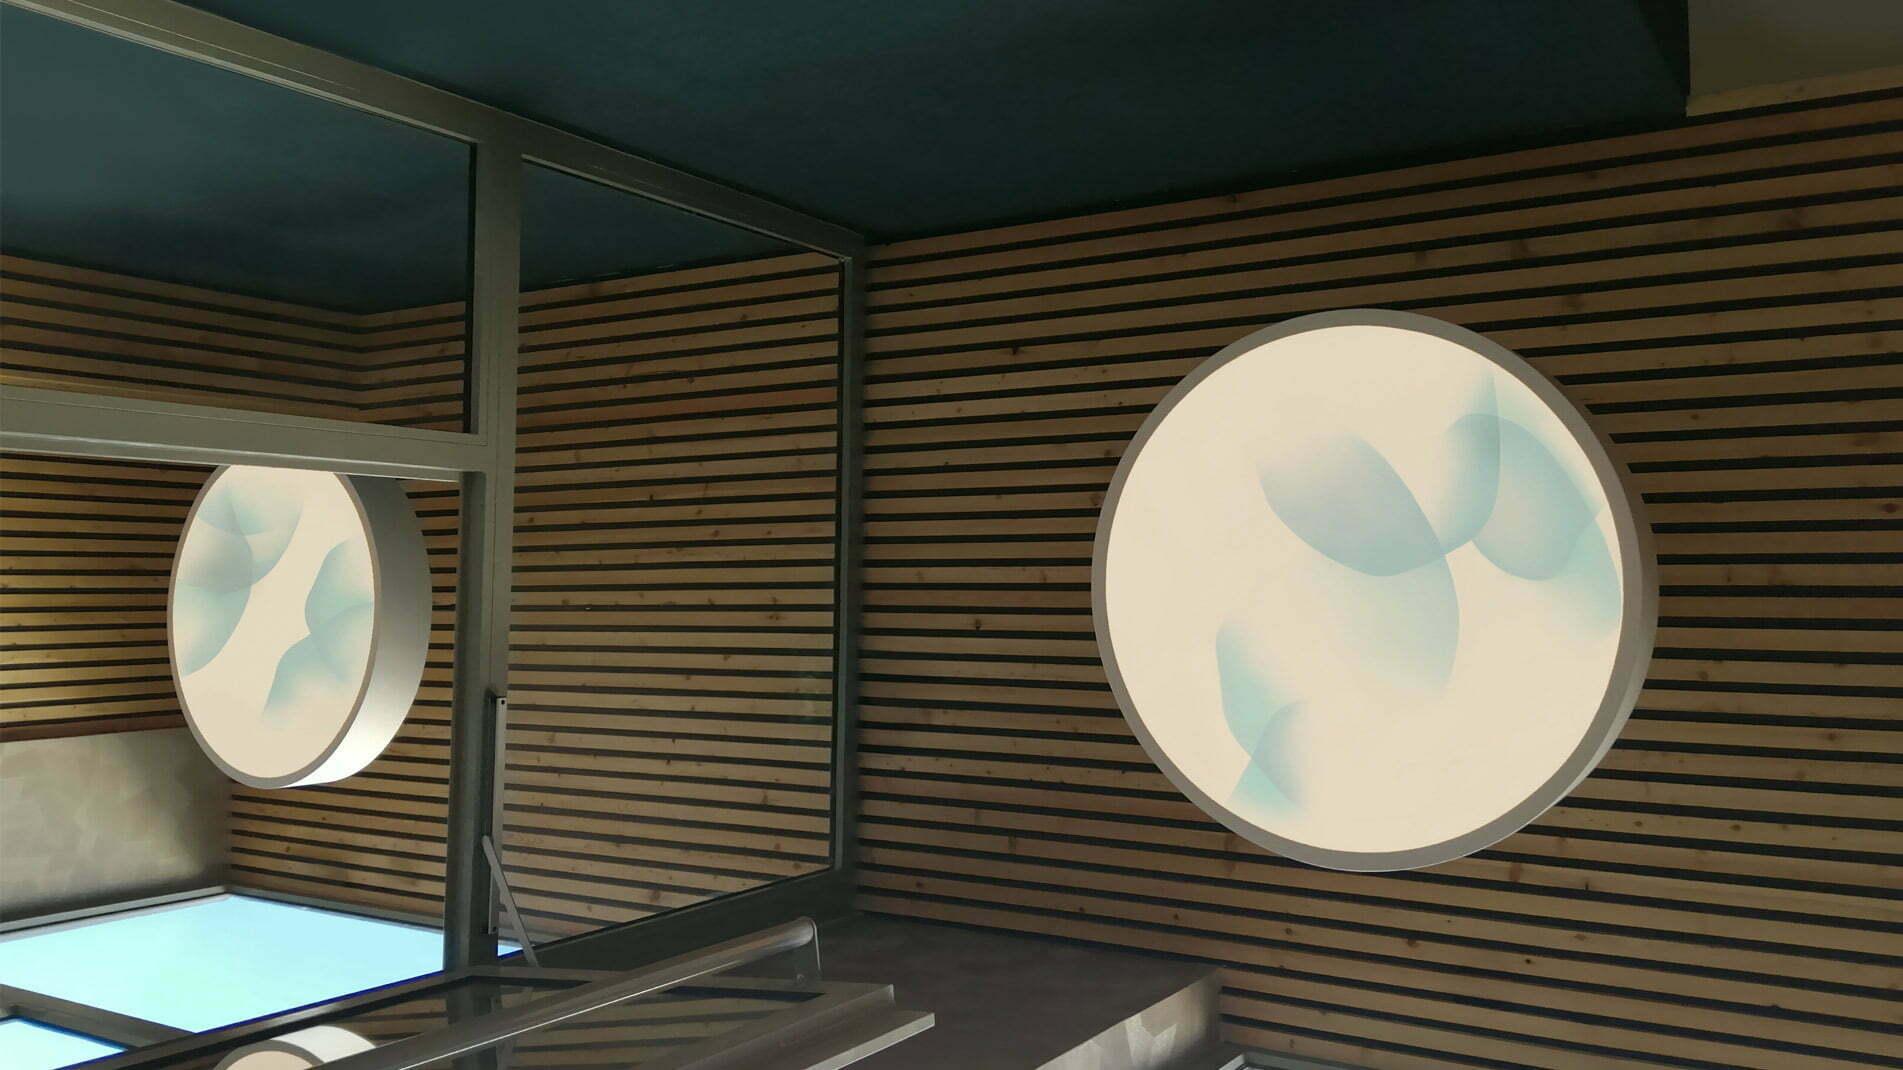 Installations lumineuses de Guillaume Bottazzi à Lyon